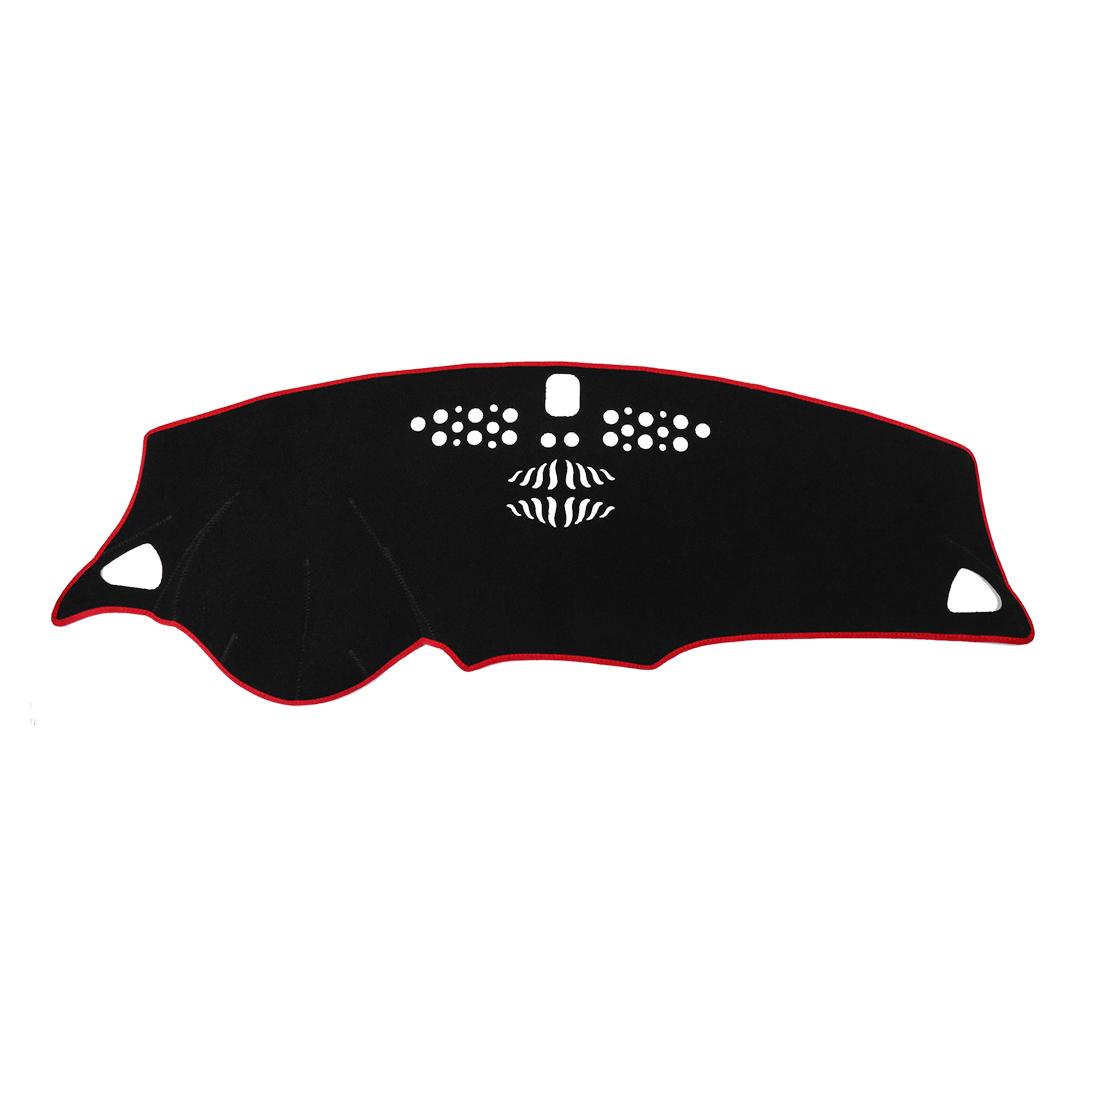 Car Dashboard Cover Nonslip Black Red Dash Mat Pad for 16-18 Chevrolet Malibu